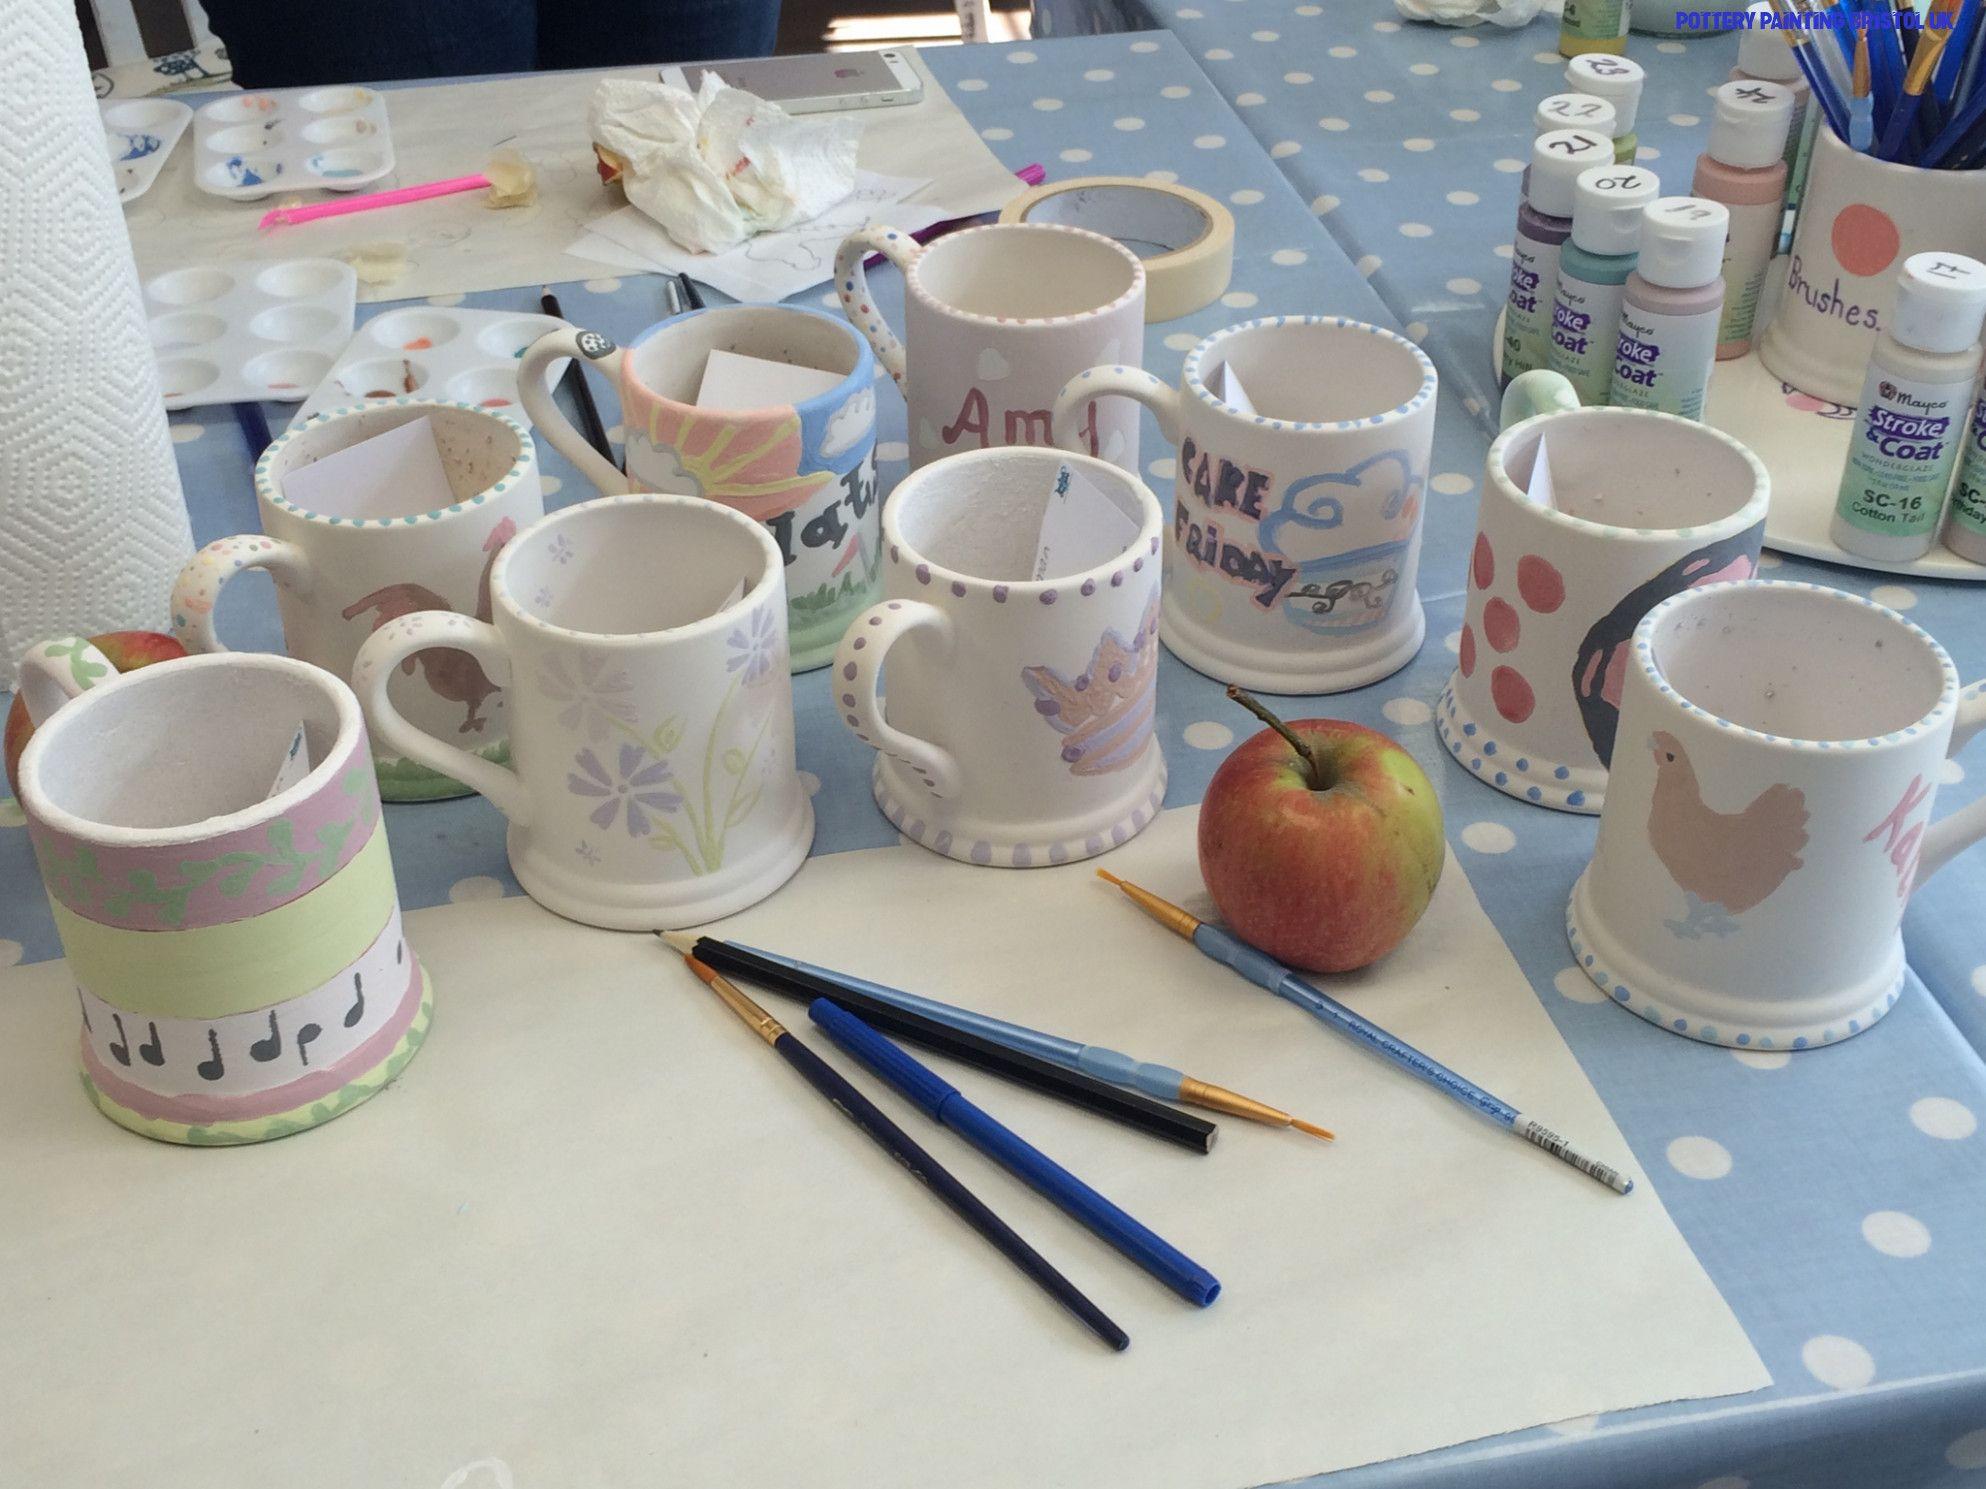 Five Top Risks Of Pottery Painting Bristol Uk Pottery Painting Bristol Uk In 2020 Pottery Painting Pottery Pottery Cafe